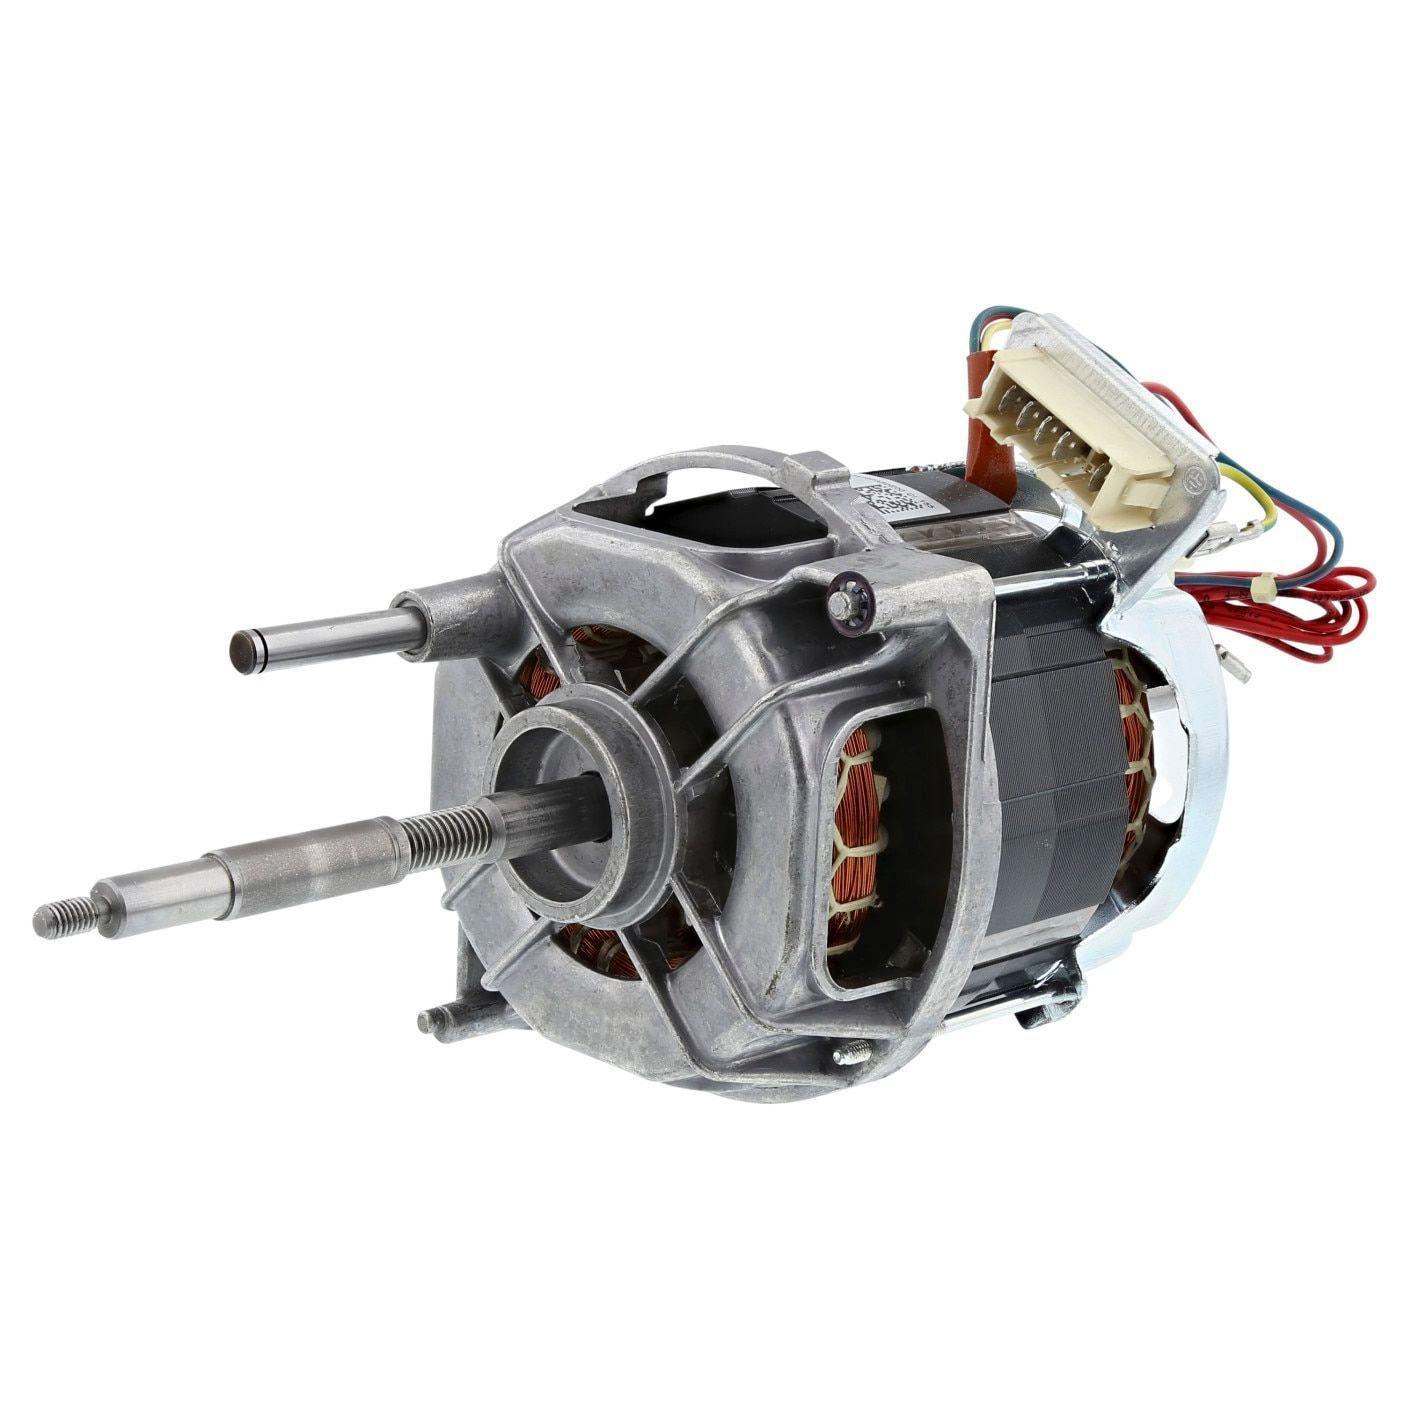 Motor sušiček AEG Electrolux Zanussi - 1366112041 AEG / Electrolux / Zanussi